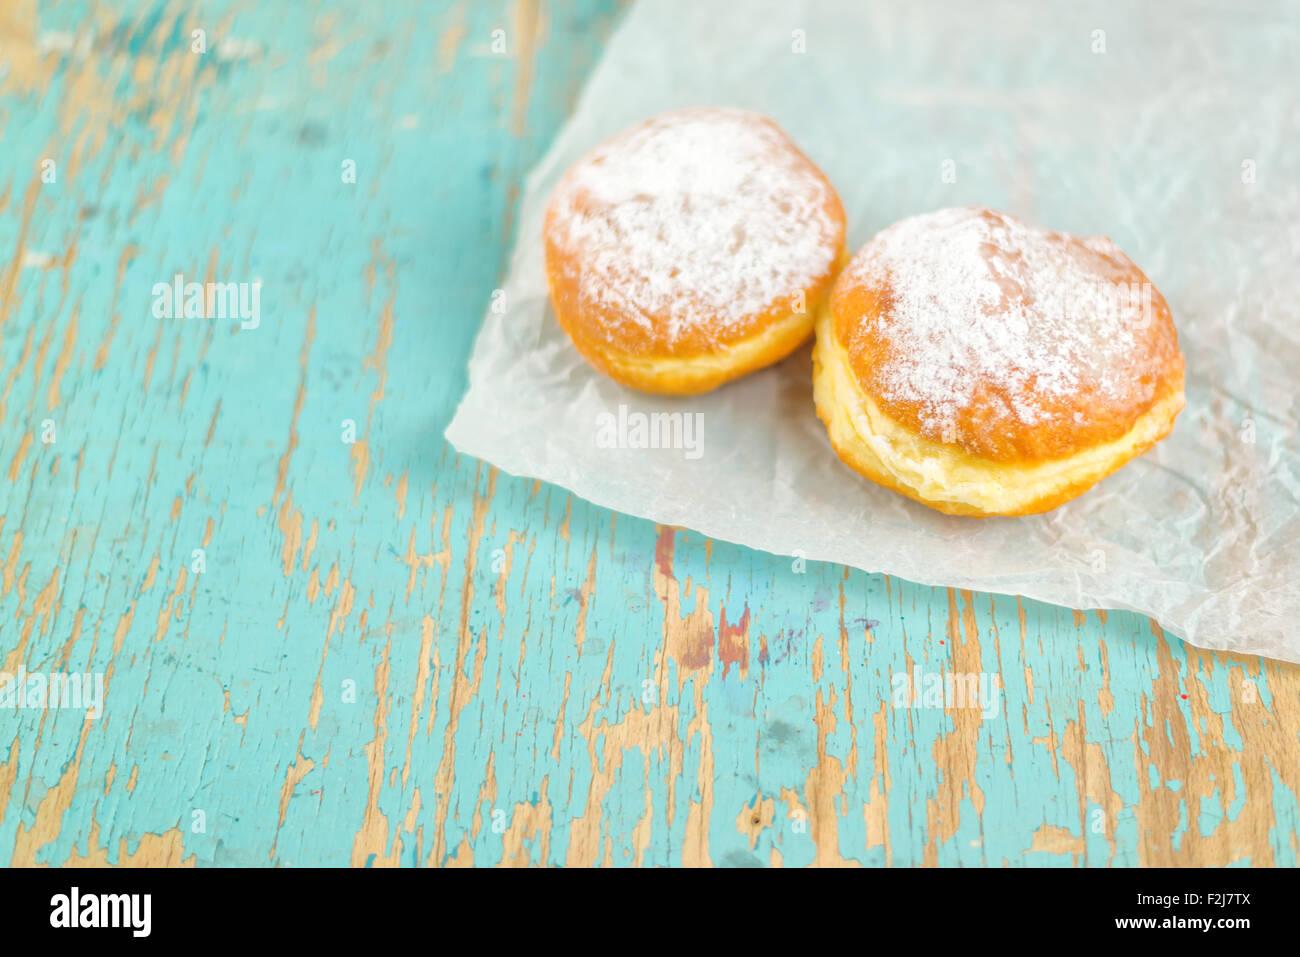 Sugar Ca Stock Photos & Sugar Ca Stock Images - Alamy